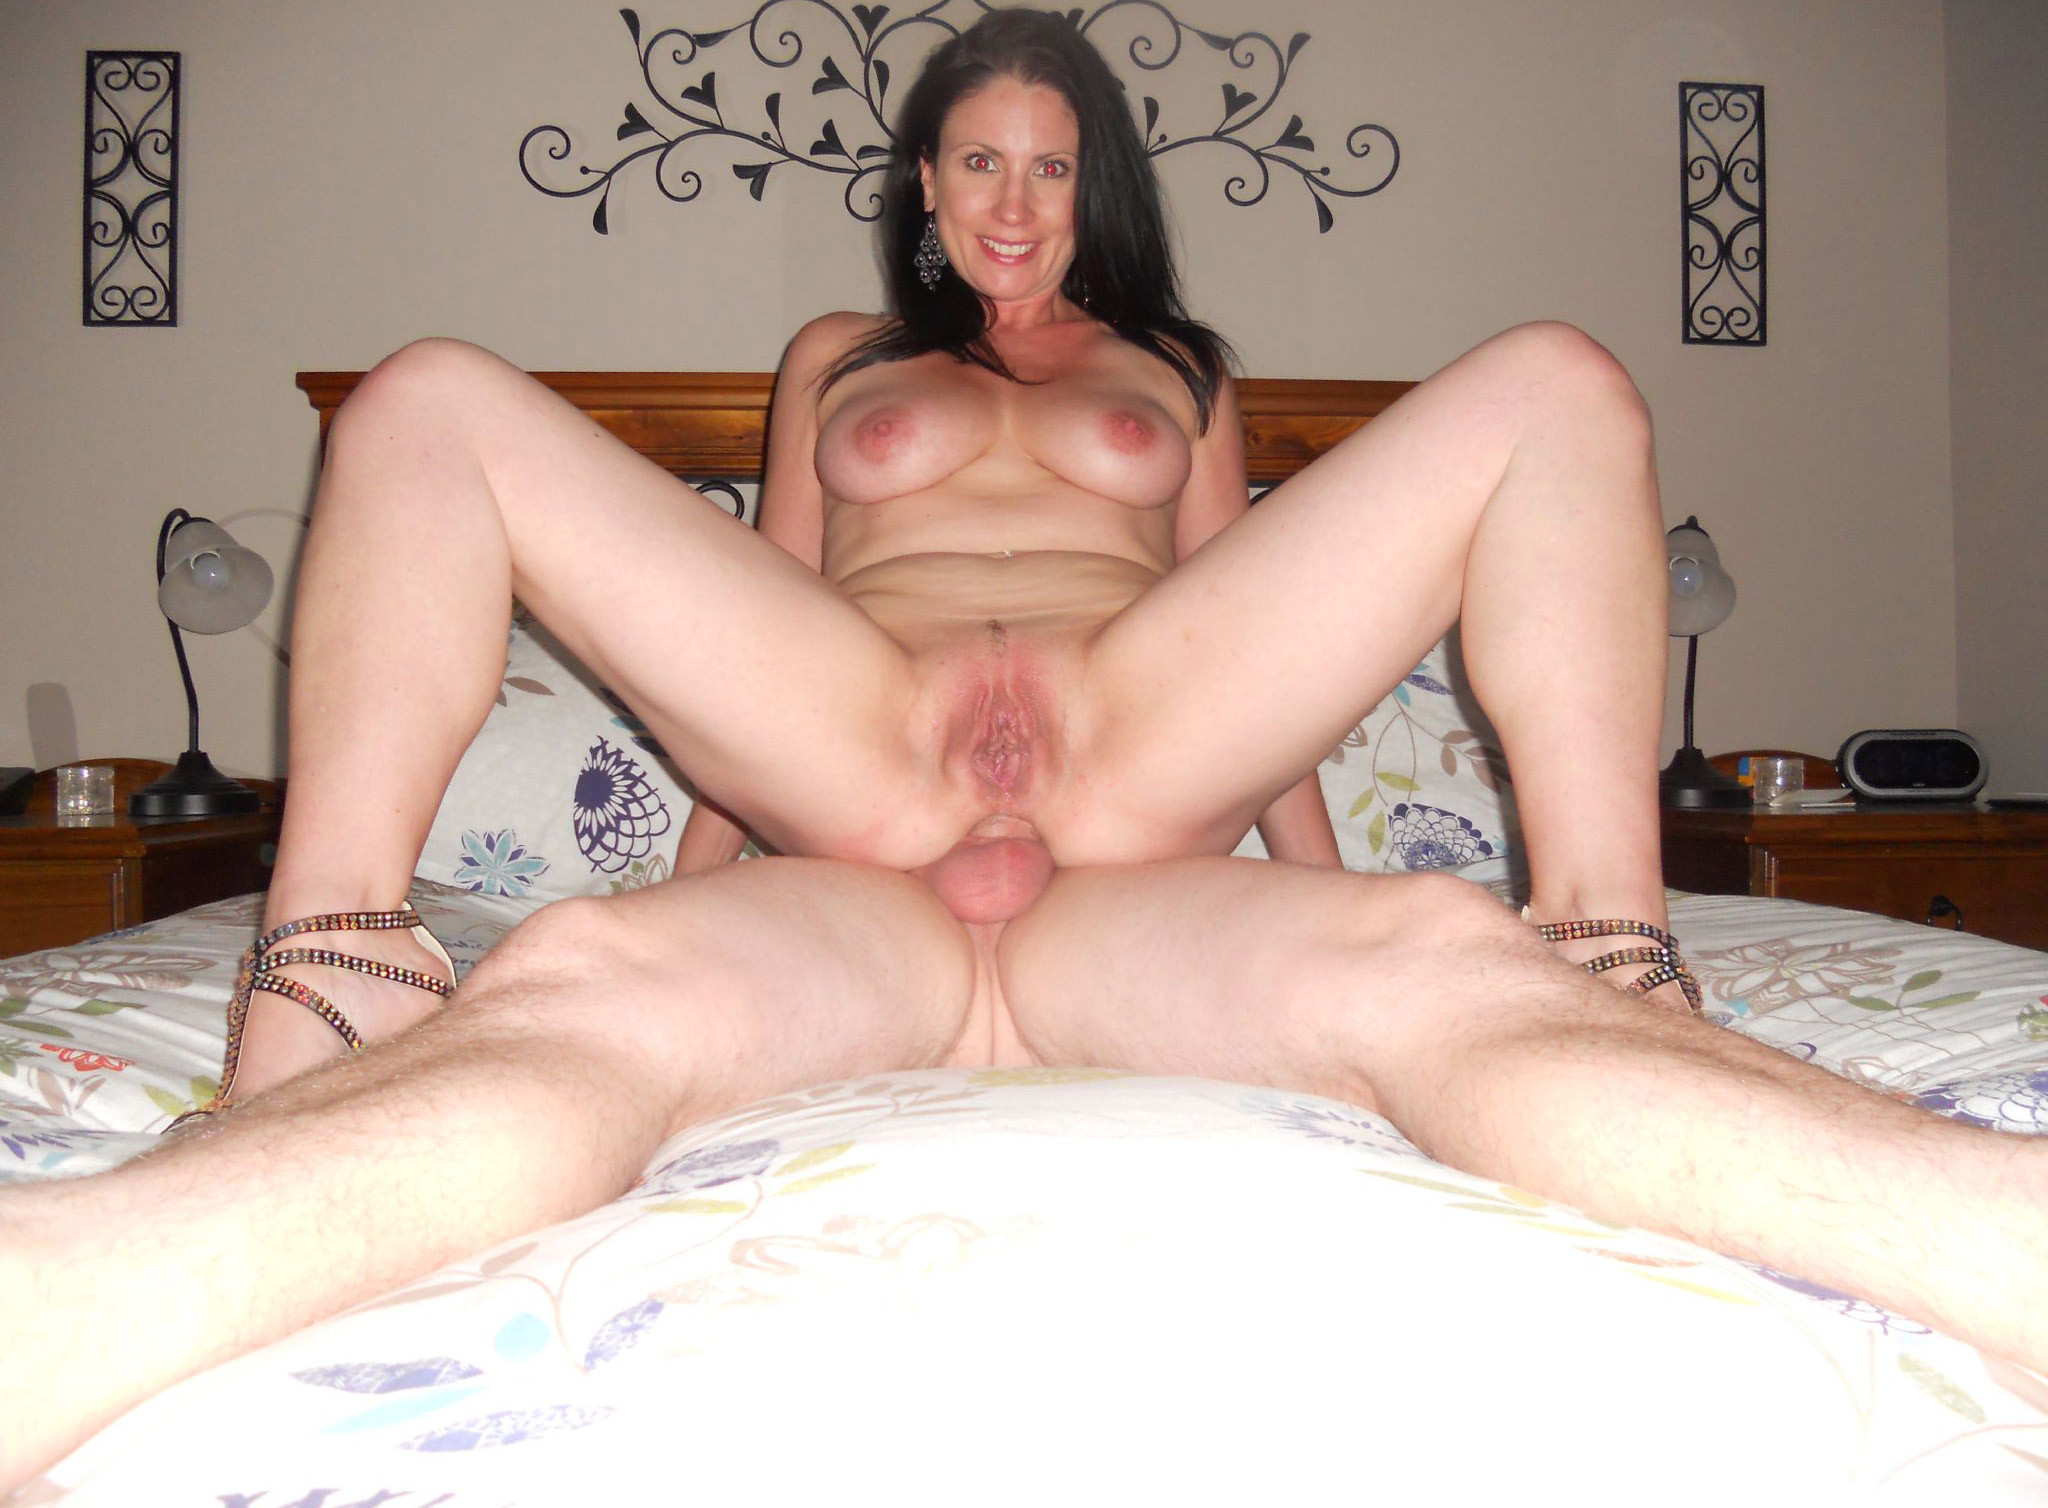 Просто фото домашнего секса - компиляция 26